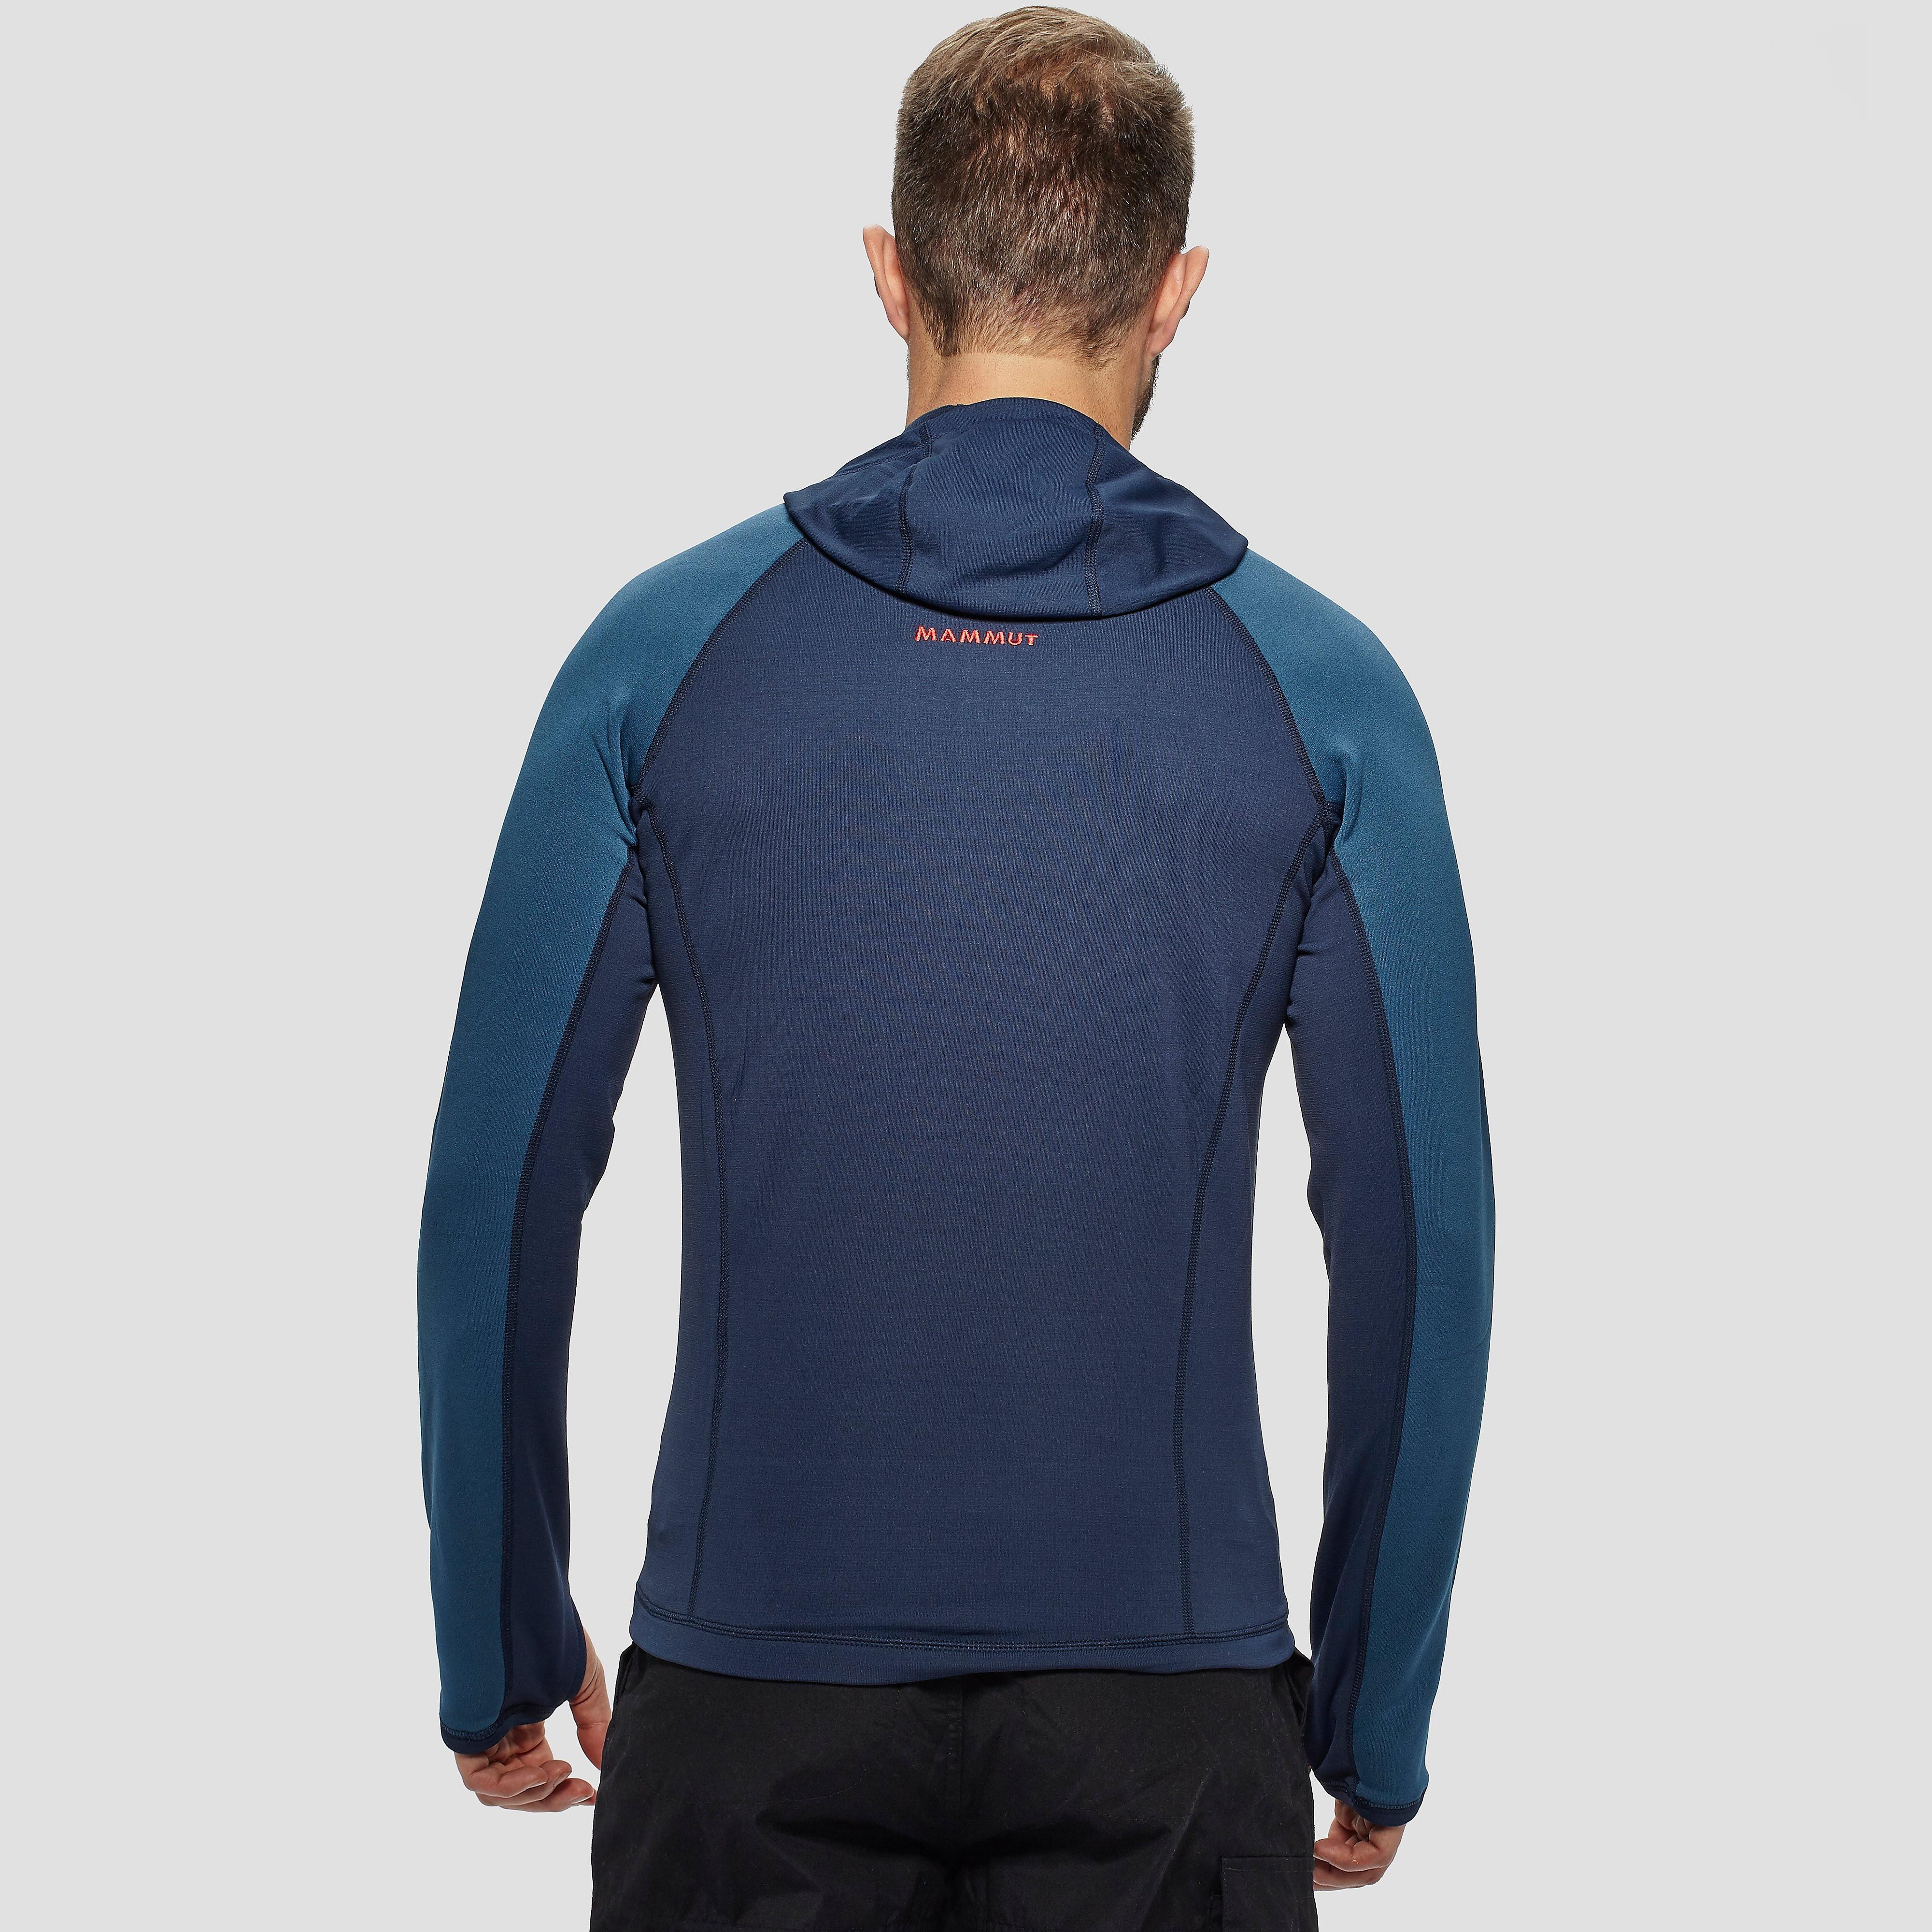 Mammut Aconcagua Pro ML Men's Hooded Jacket